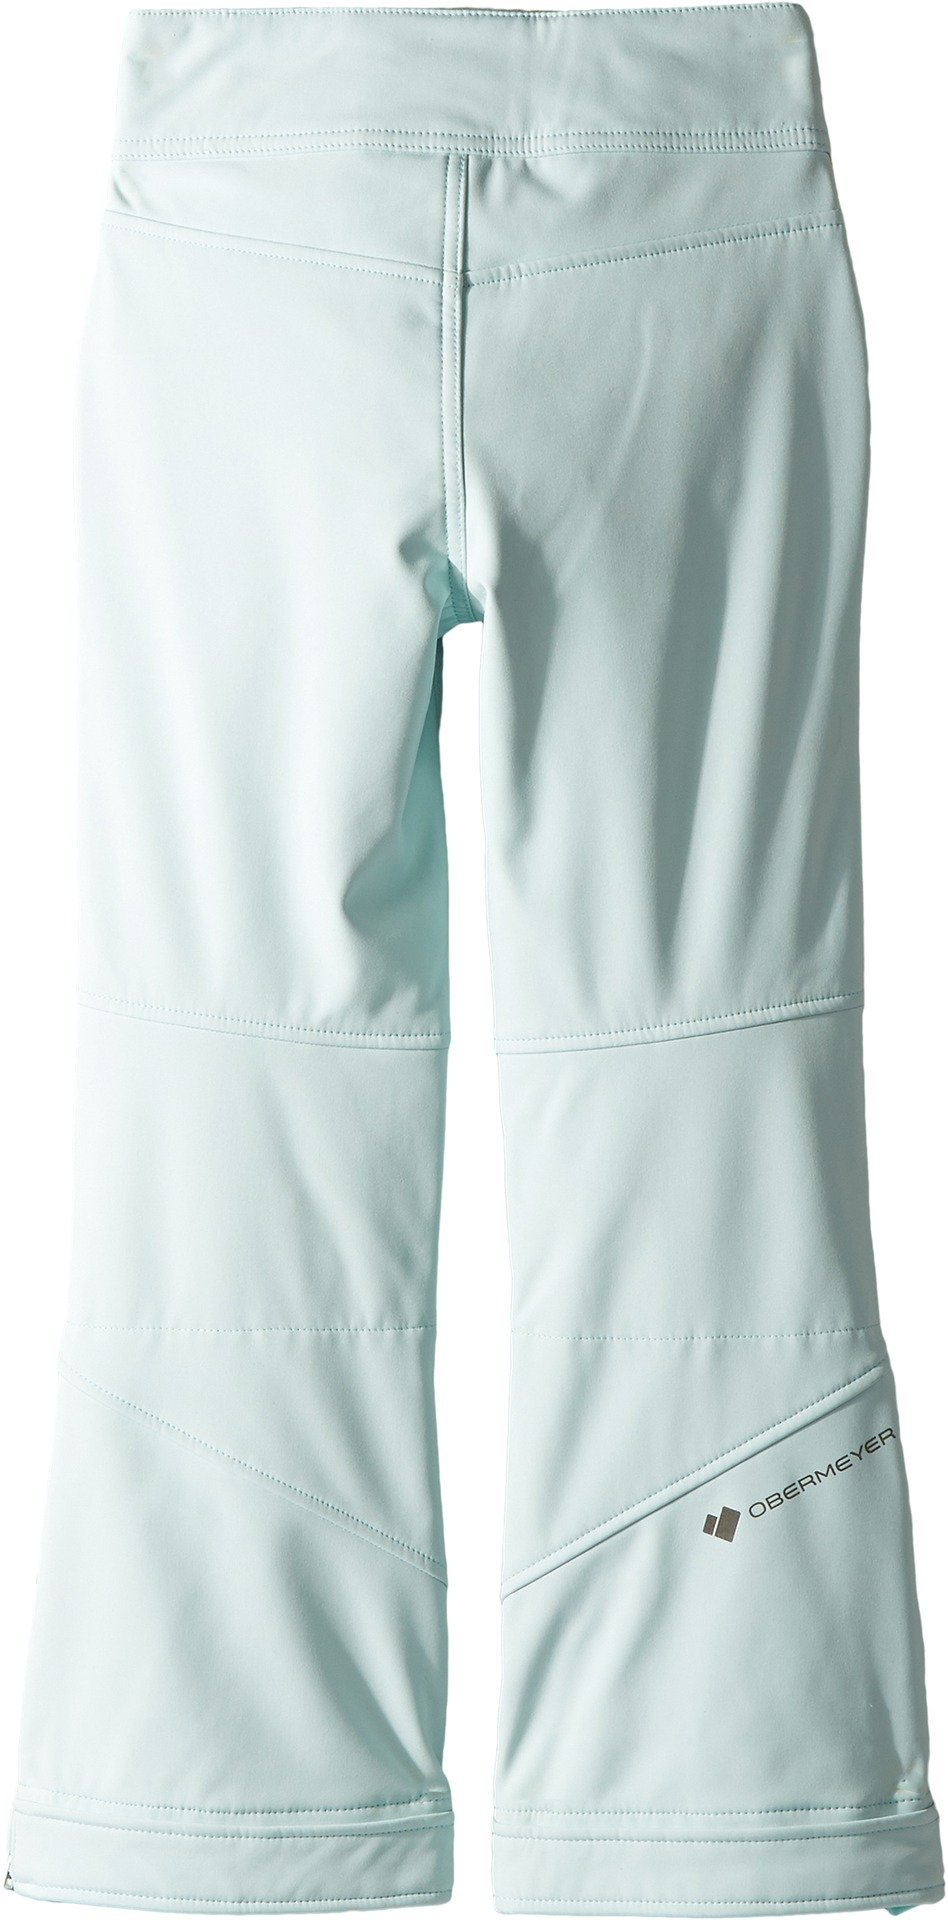 Obermeyer Kids Girl's Jolie Softshell Pants (Little Kids/Big Kids) Seaglass Small by Obermeyer Kids (Image #2)